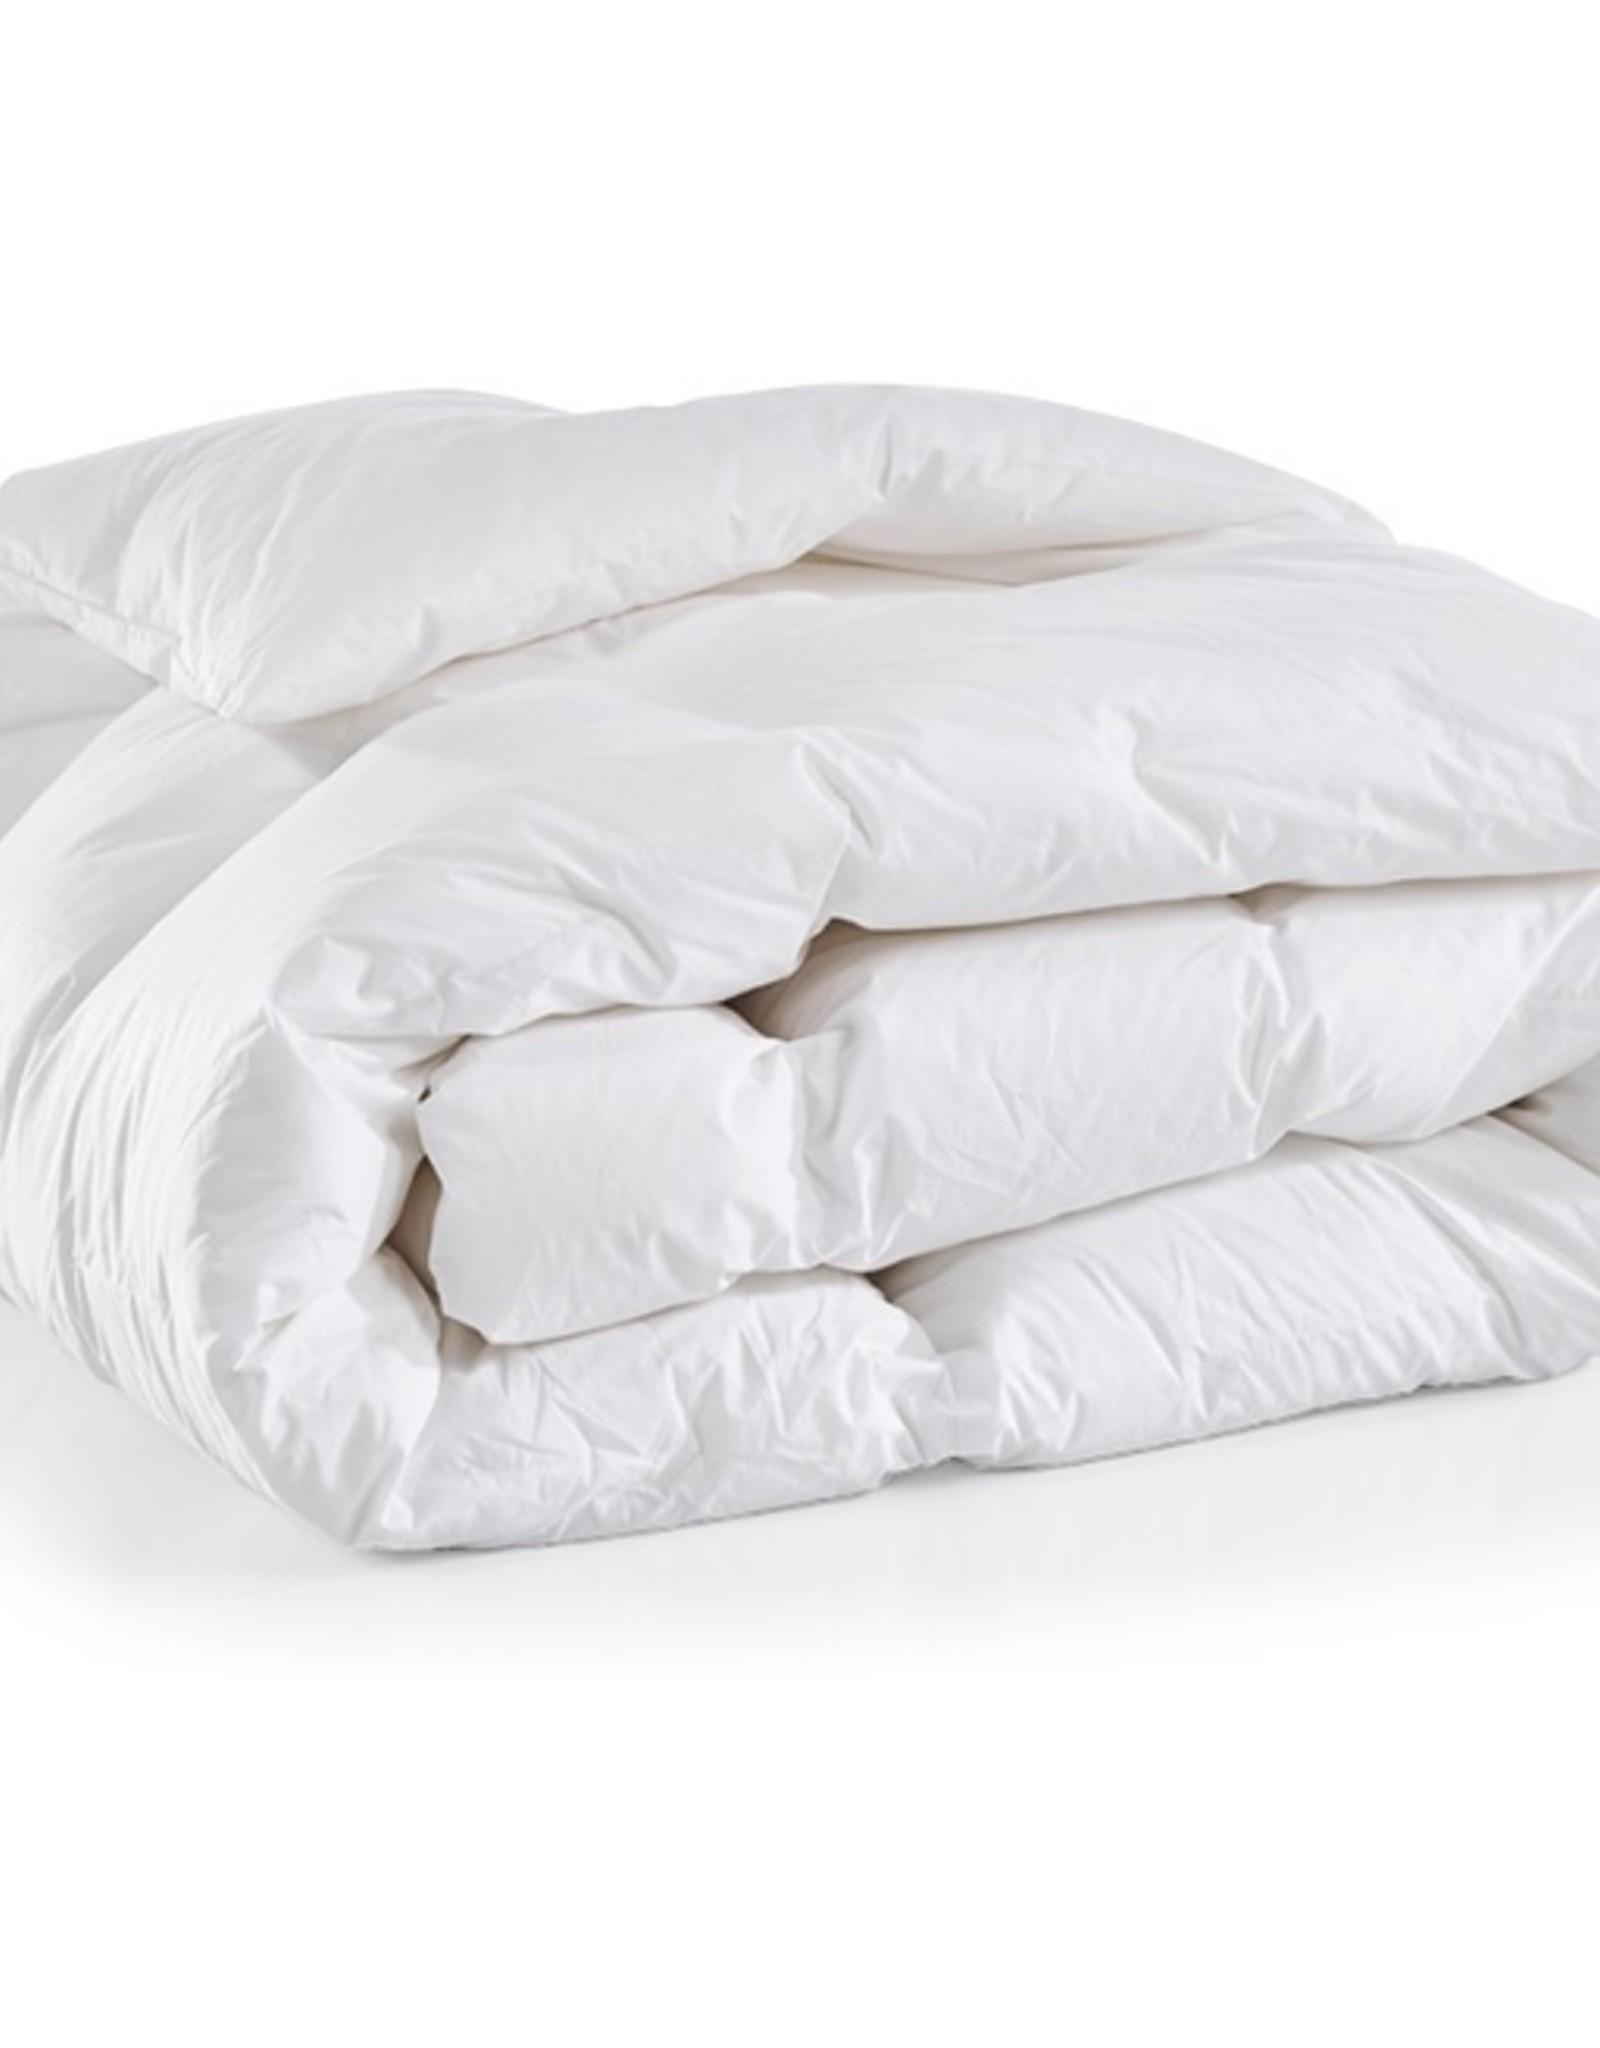 Sleepconsult Donsdeken Hongaarse 90% Winter